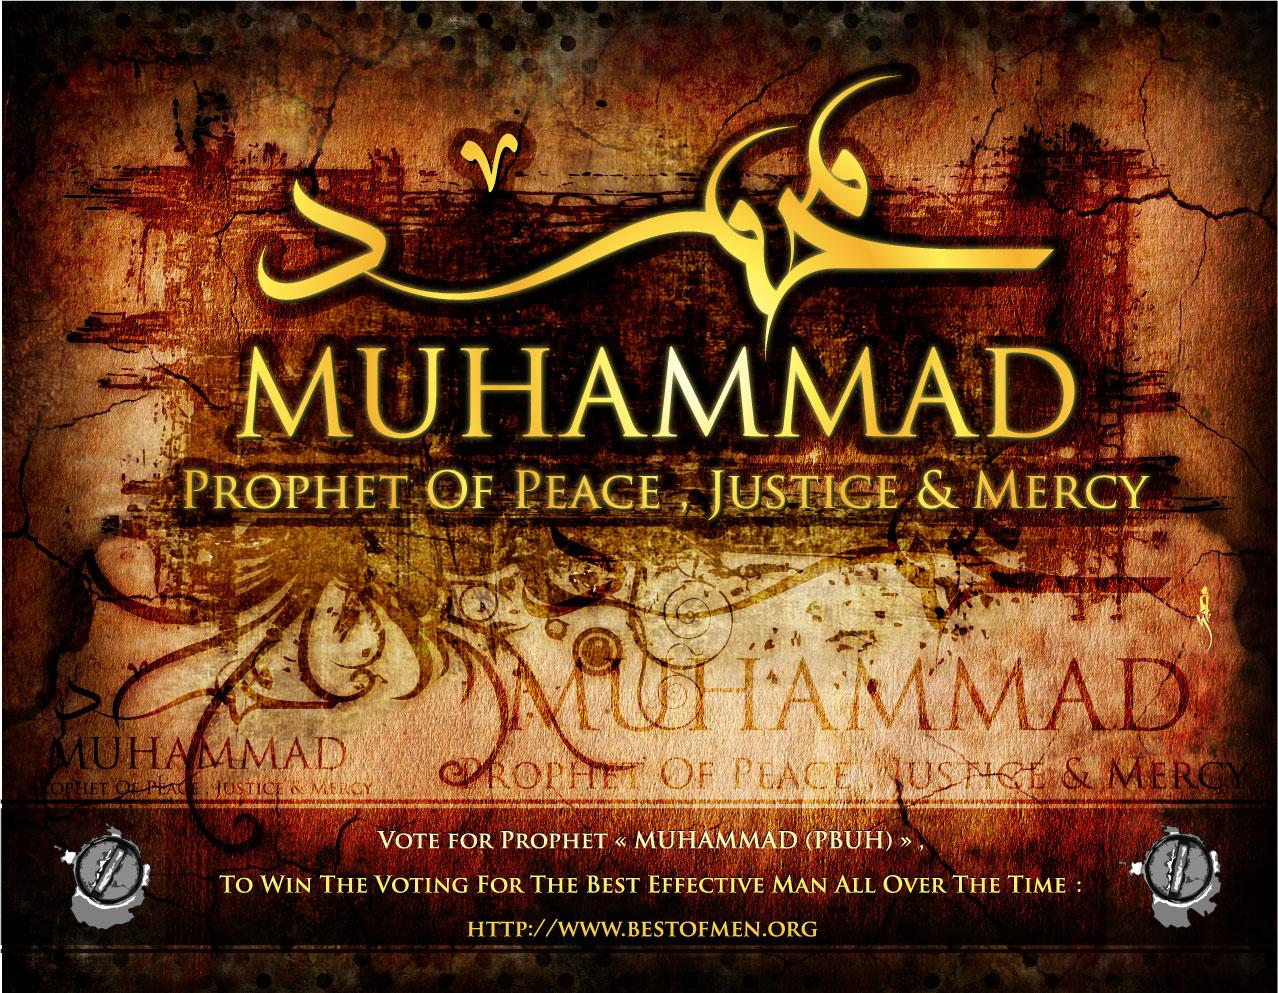 http://2.bp.blogspot.com/-nUpqIJpC4W8/T2BoLRDevDI/AAAAAAAAArI/N6g1nTNDHxs/s1600/Wallpaper+Muhammad+Rasulullah+%252840%2529.jpg